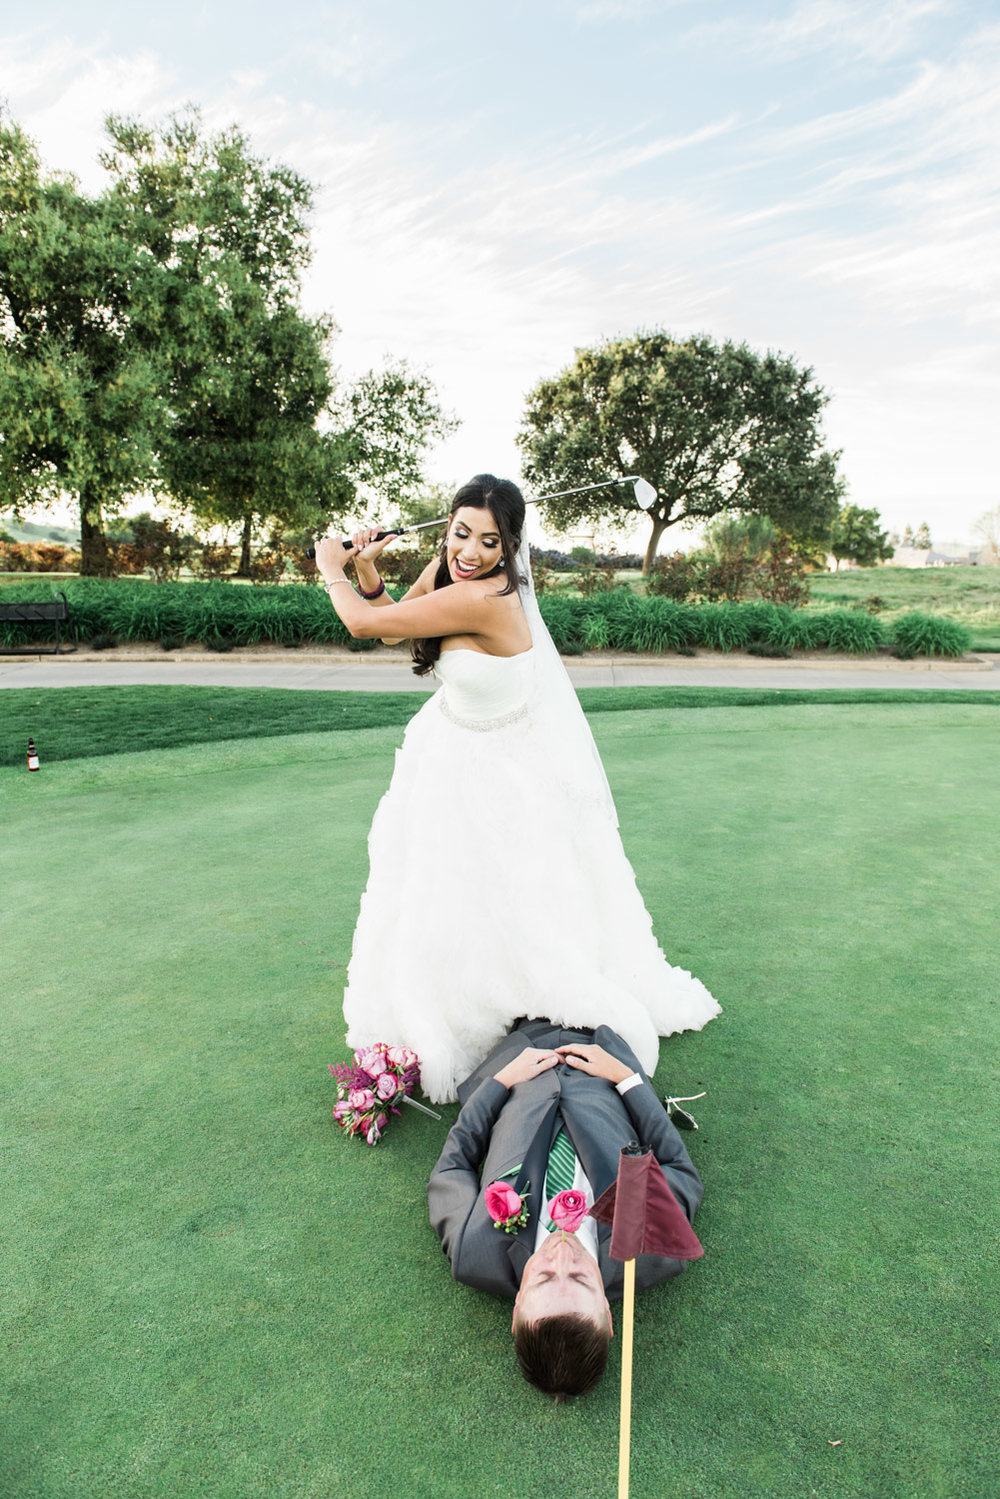 golf-course-themed-wedding-photography-afewgoodclicks-net